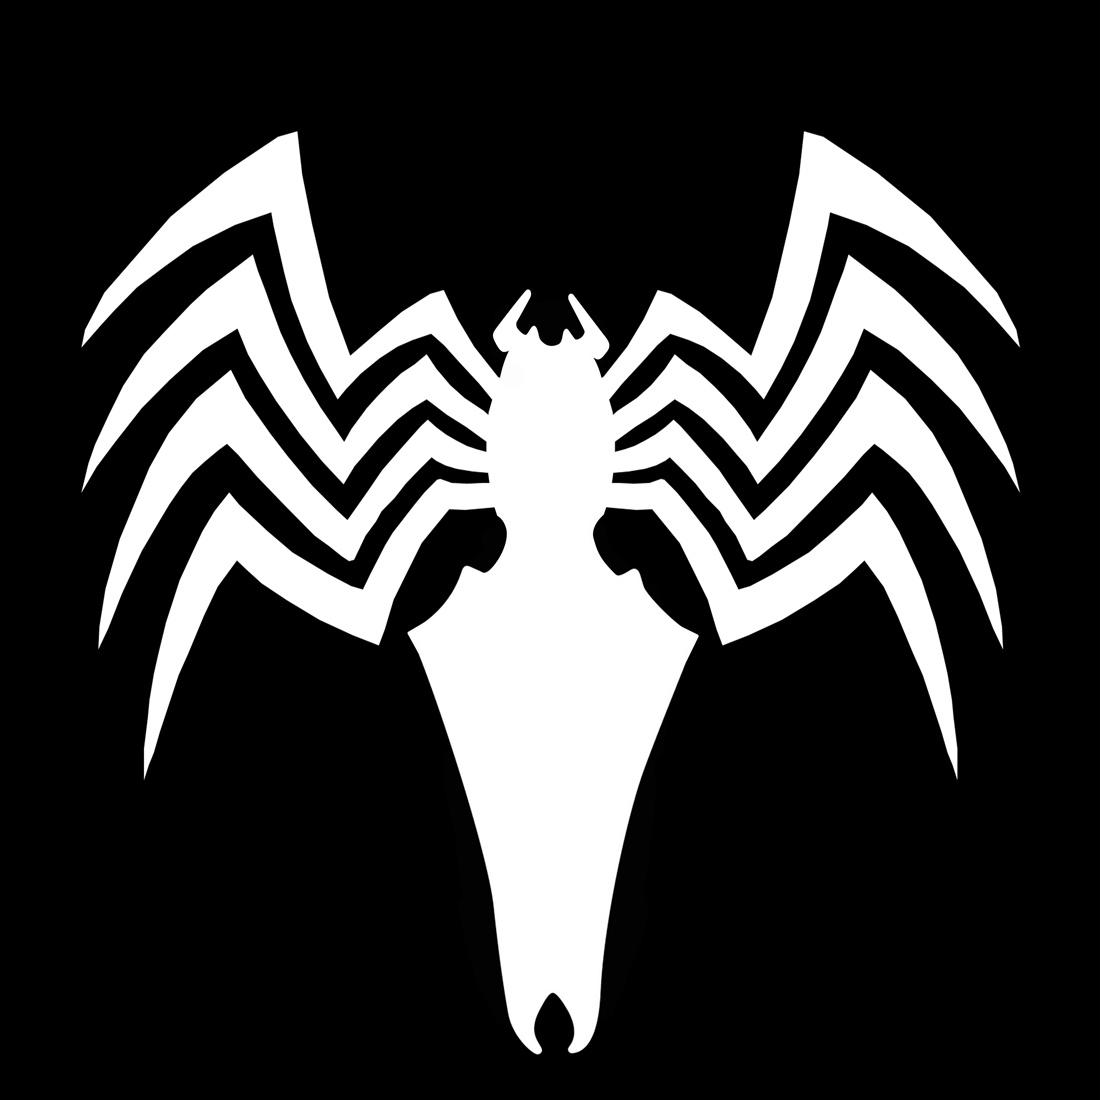 https://0901.nccdn.net/4_2/000/000/046/6ea/venom-part-2-gosexyca-1100x1100.jpg